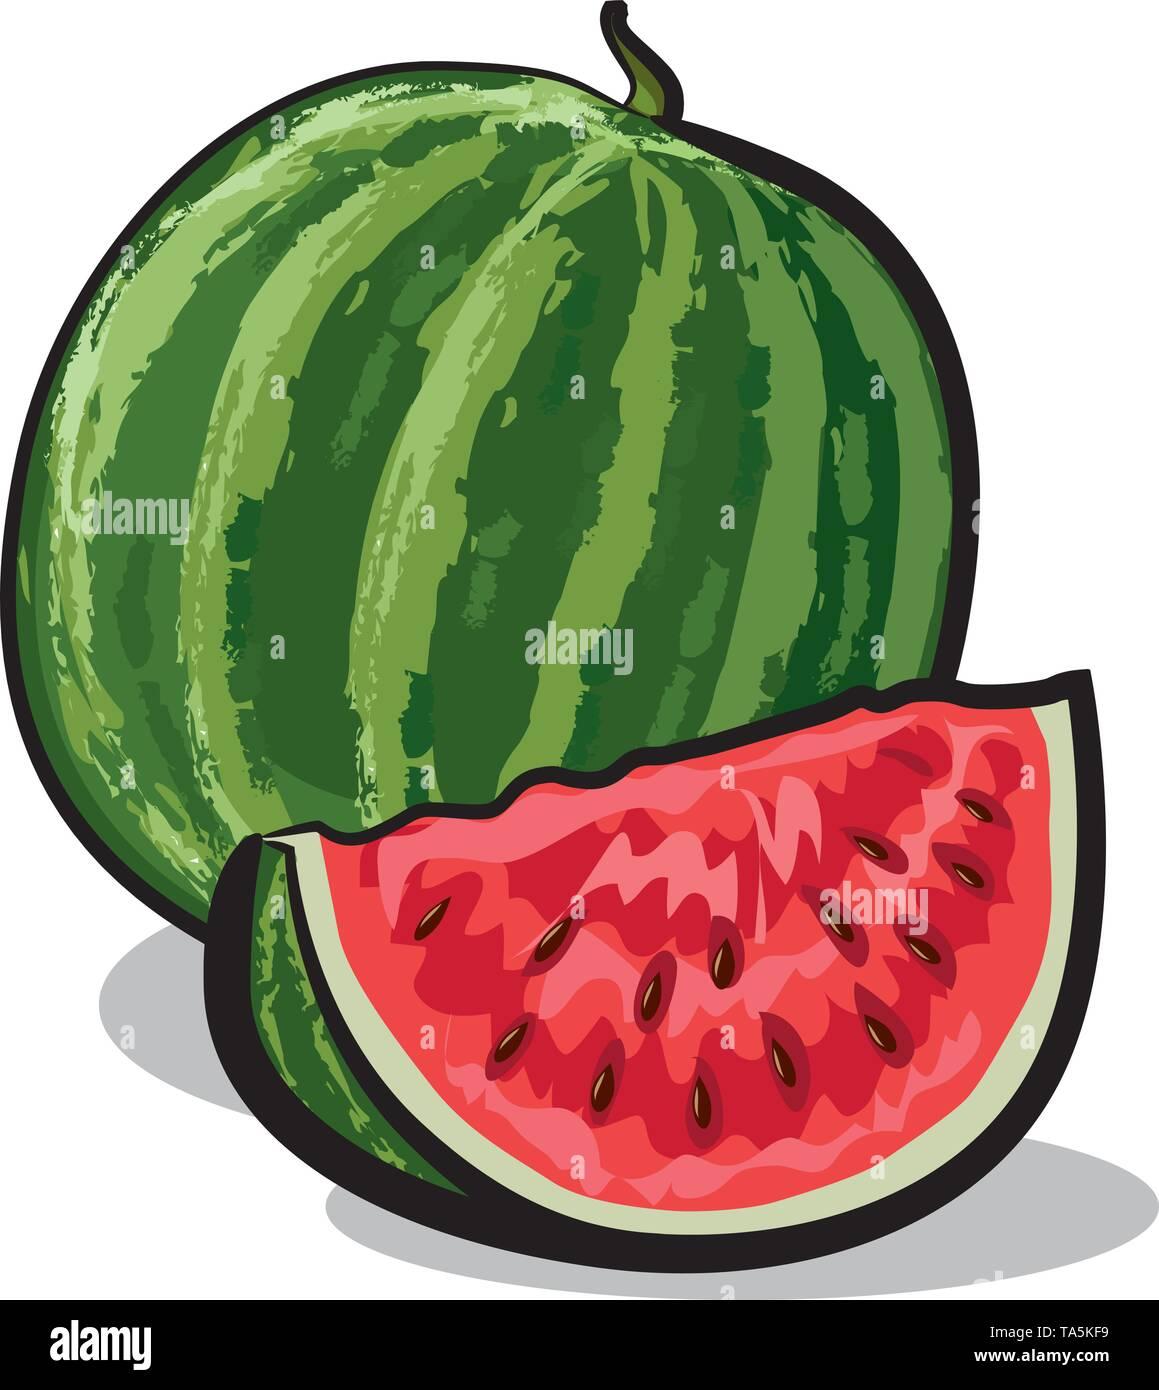 watermelon - Stock Image